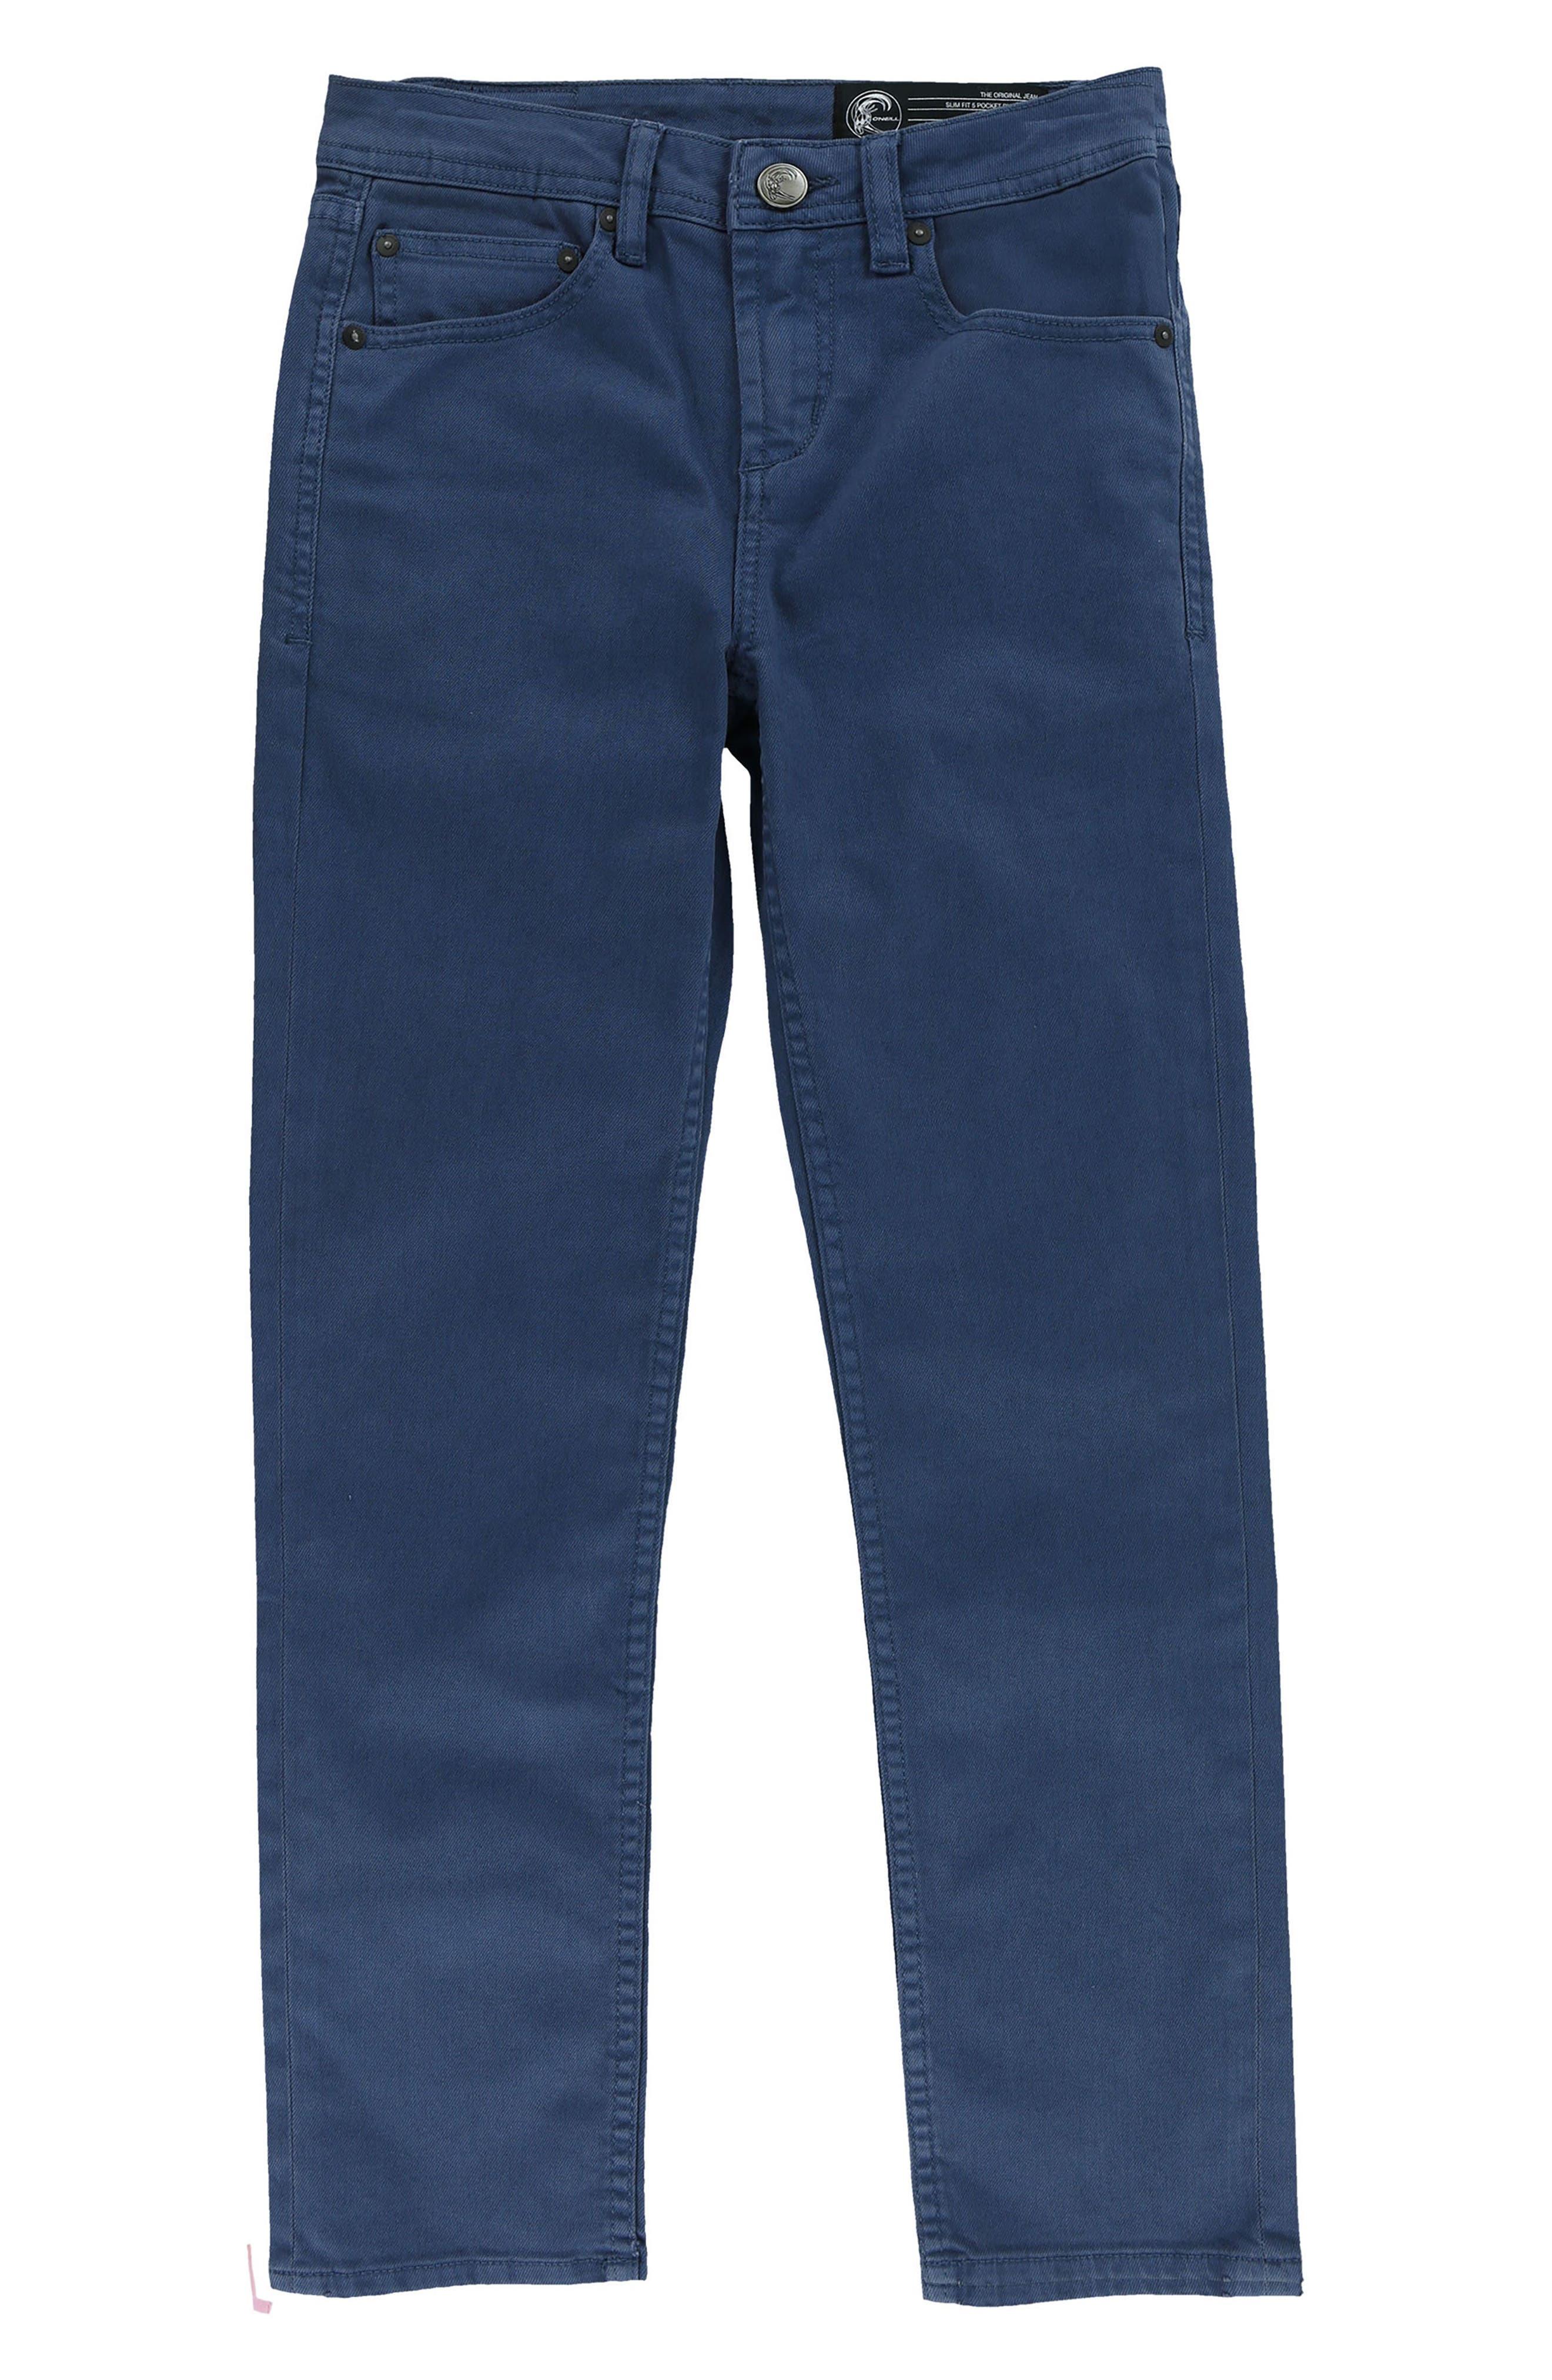 Main Image - O'Neill The Slim Twill Pants (Big Boys)